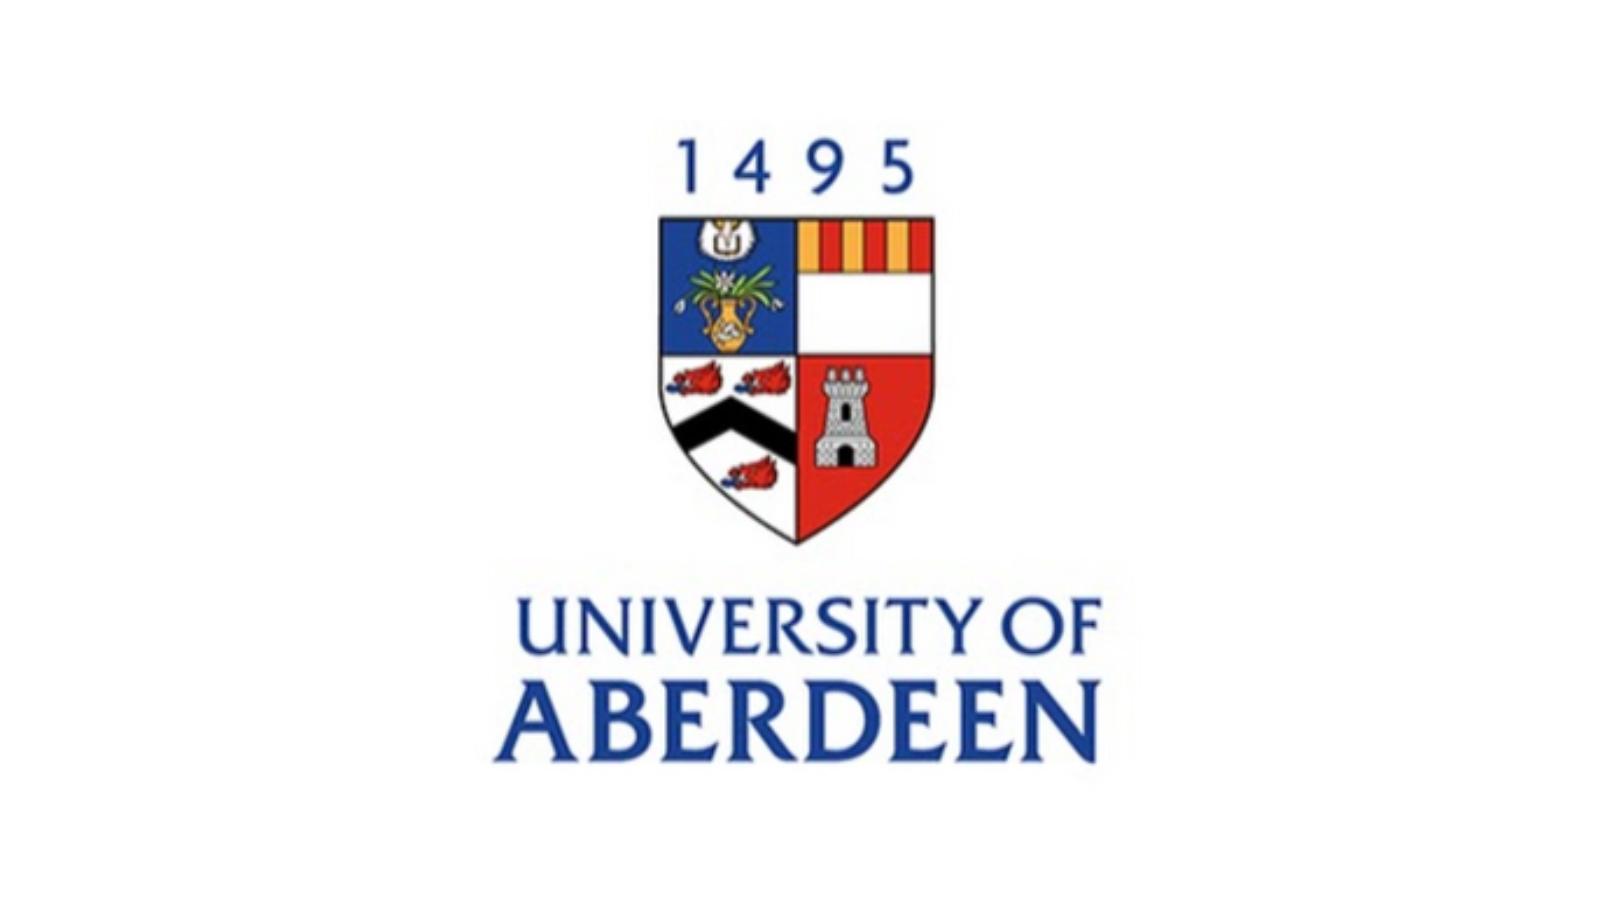 University of Aberdeen scientists to examine impact of lockdown on behaviour patterns